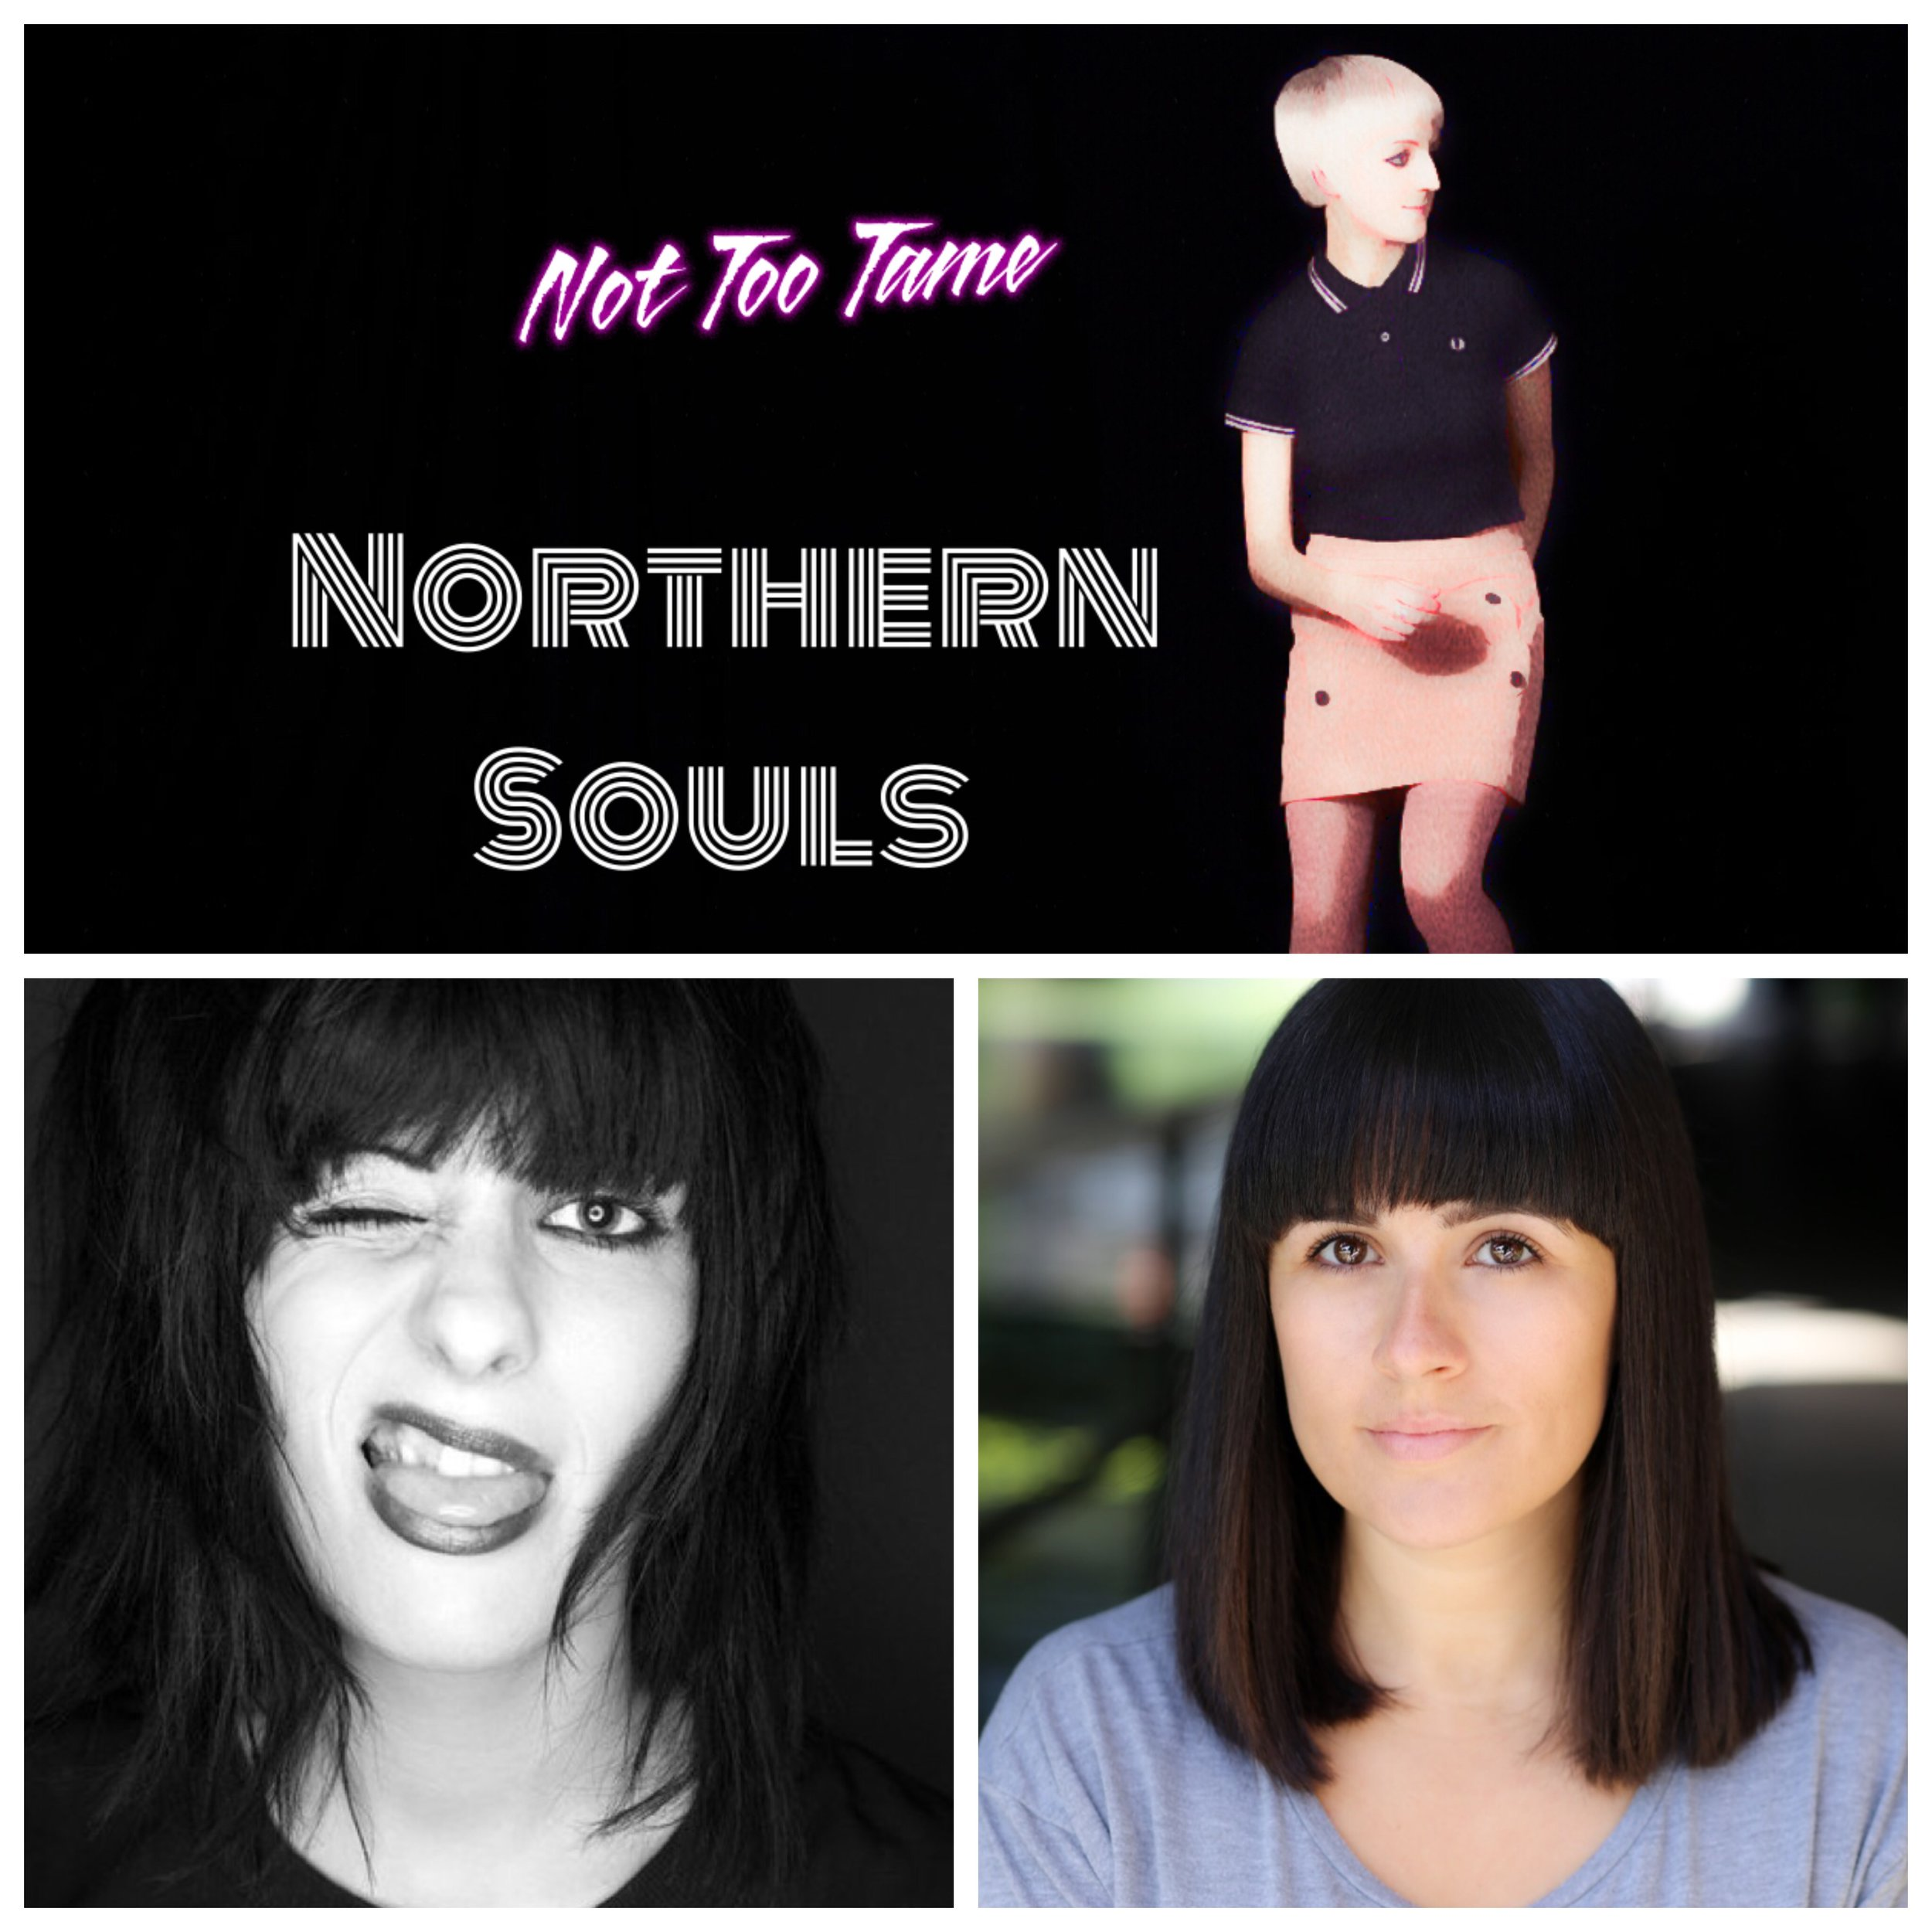 Northern souls girls.jpg